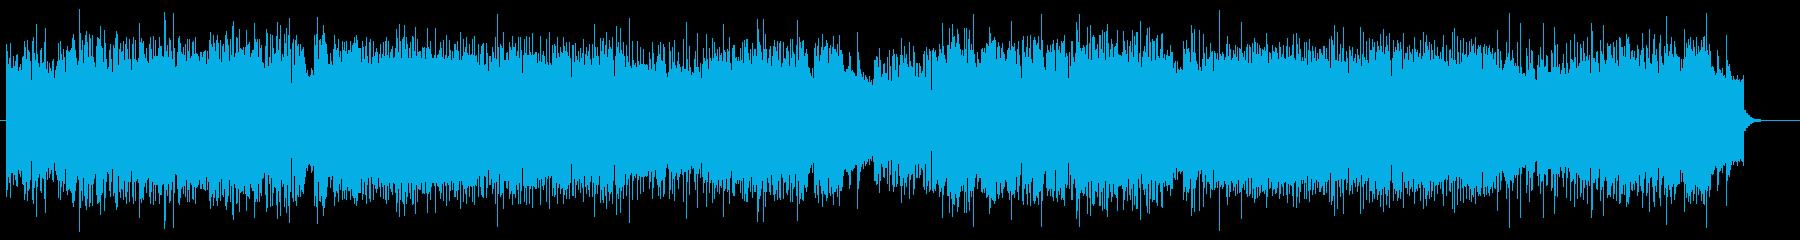 HEAVYMETAL「DEATH」306の再生済みの波形